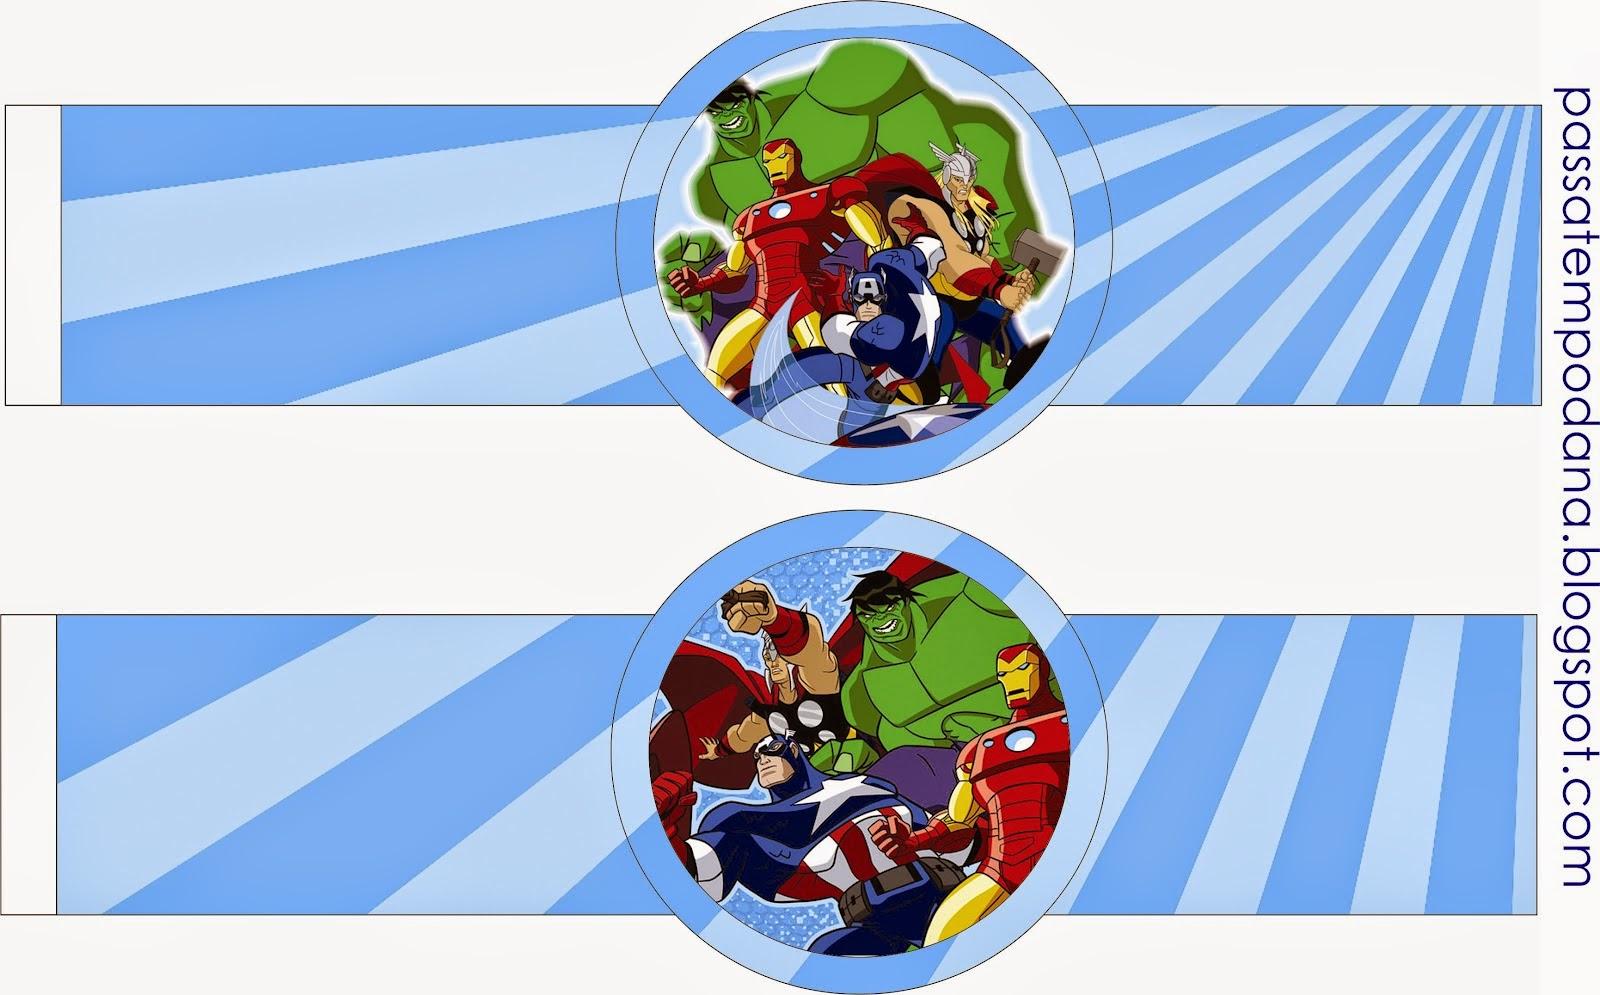 Dorable The Avengers Para Colorear Imprimible Bandera - Enmarcado ...